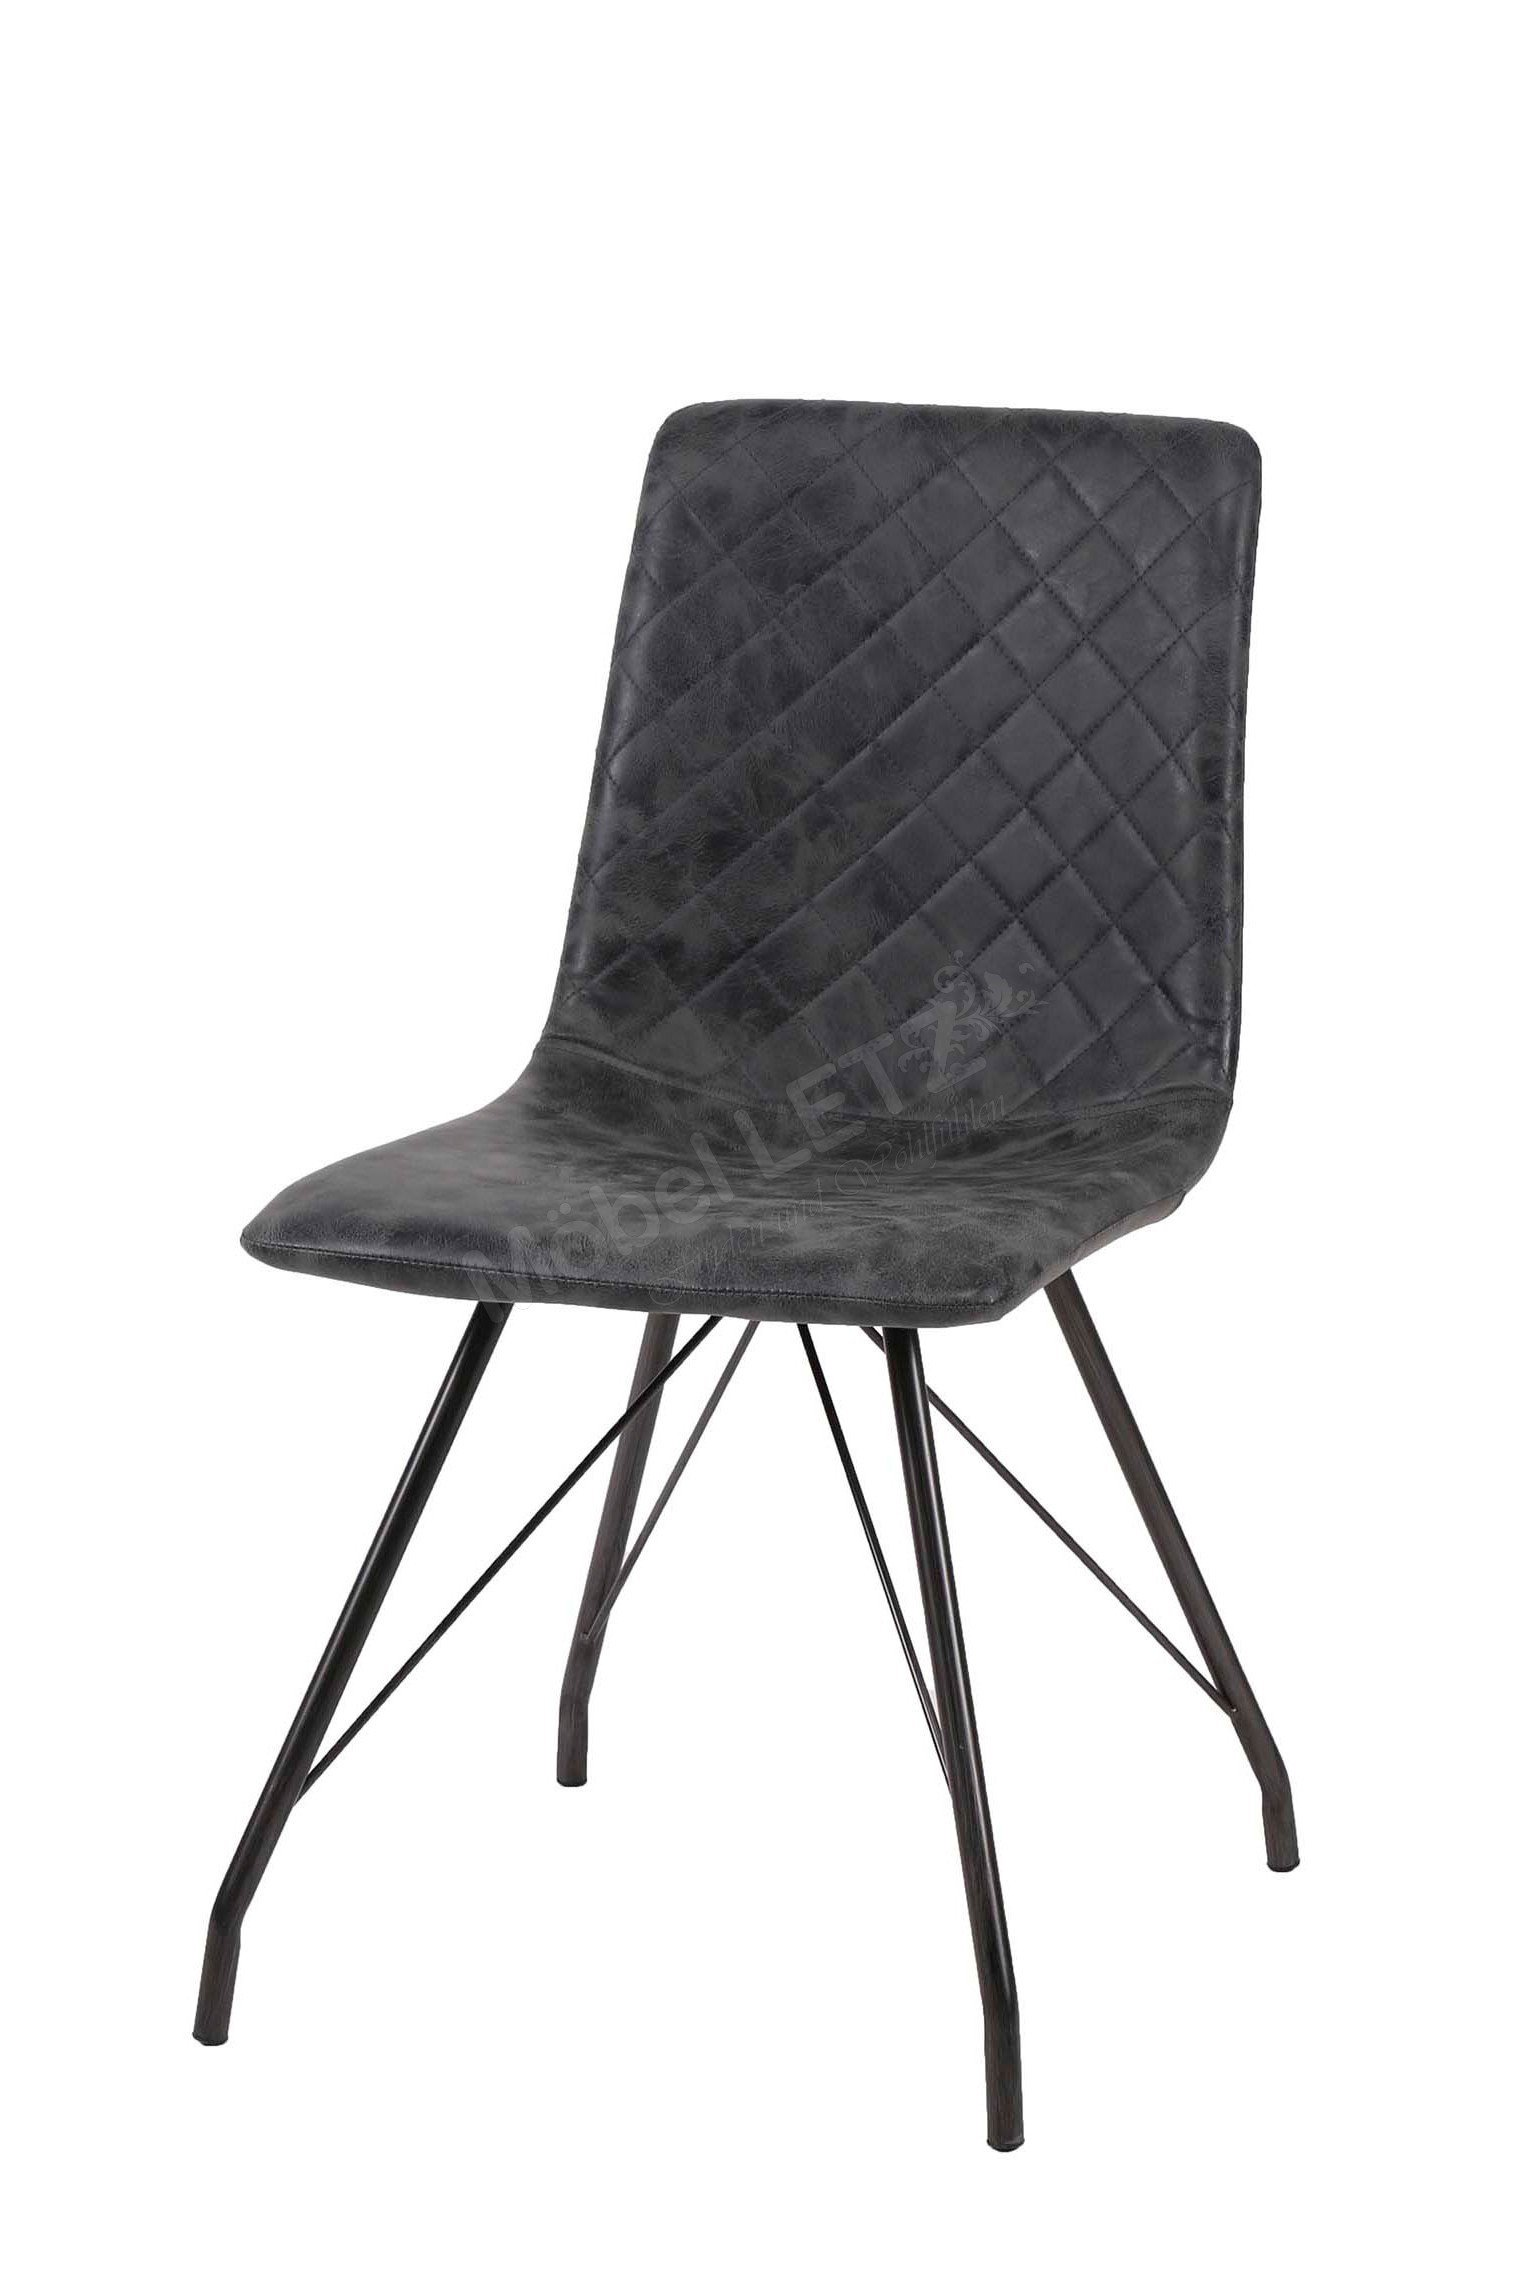 zijlstra stuhl laurens mit schwarzem gestell m bel letz ihr online shop. Black Bedroom Furniture Sets. Home Design Ideas